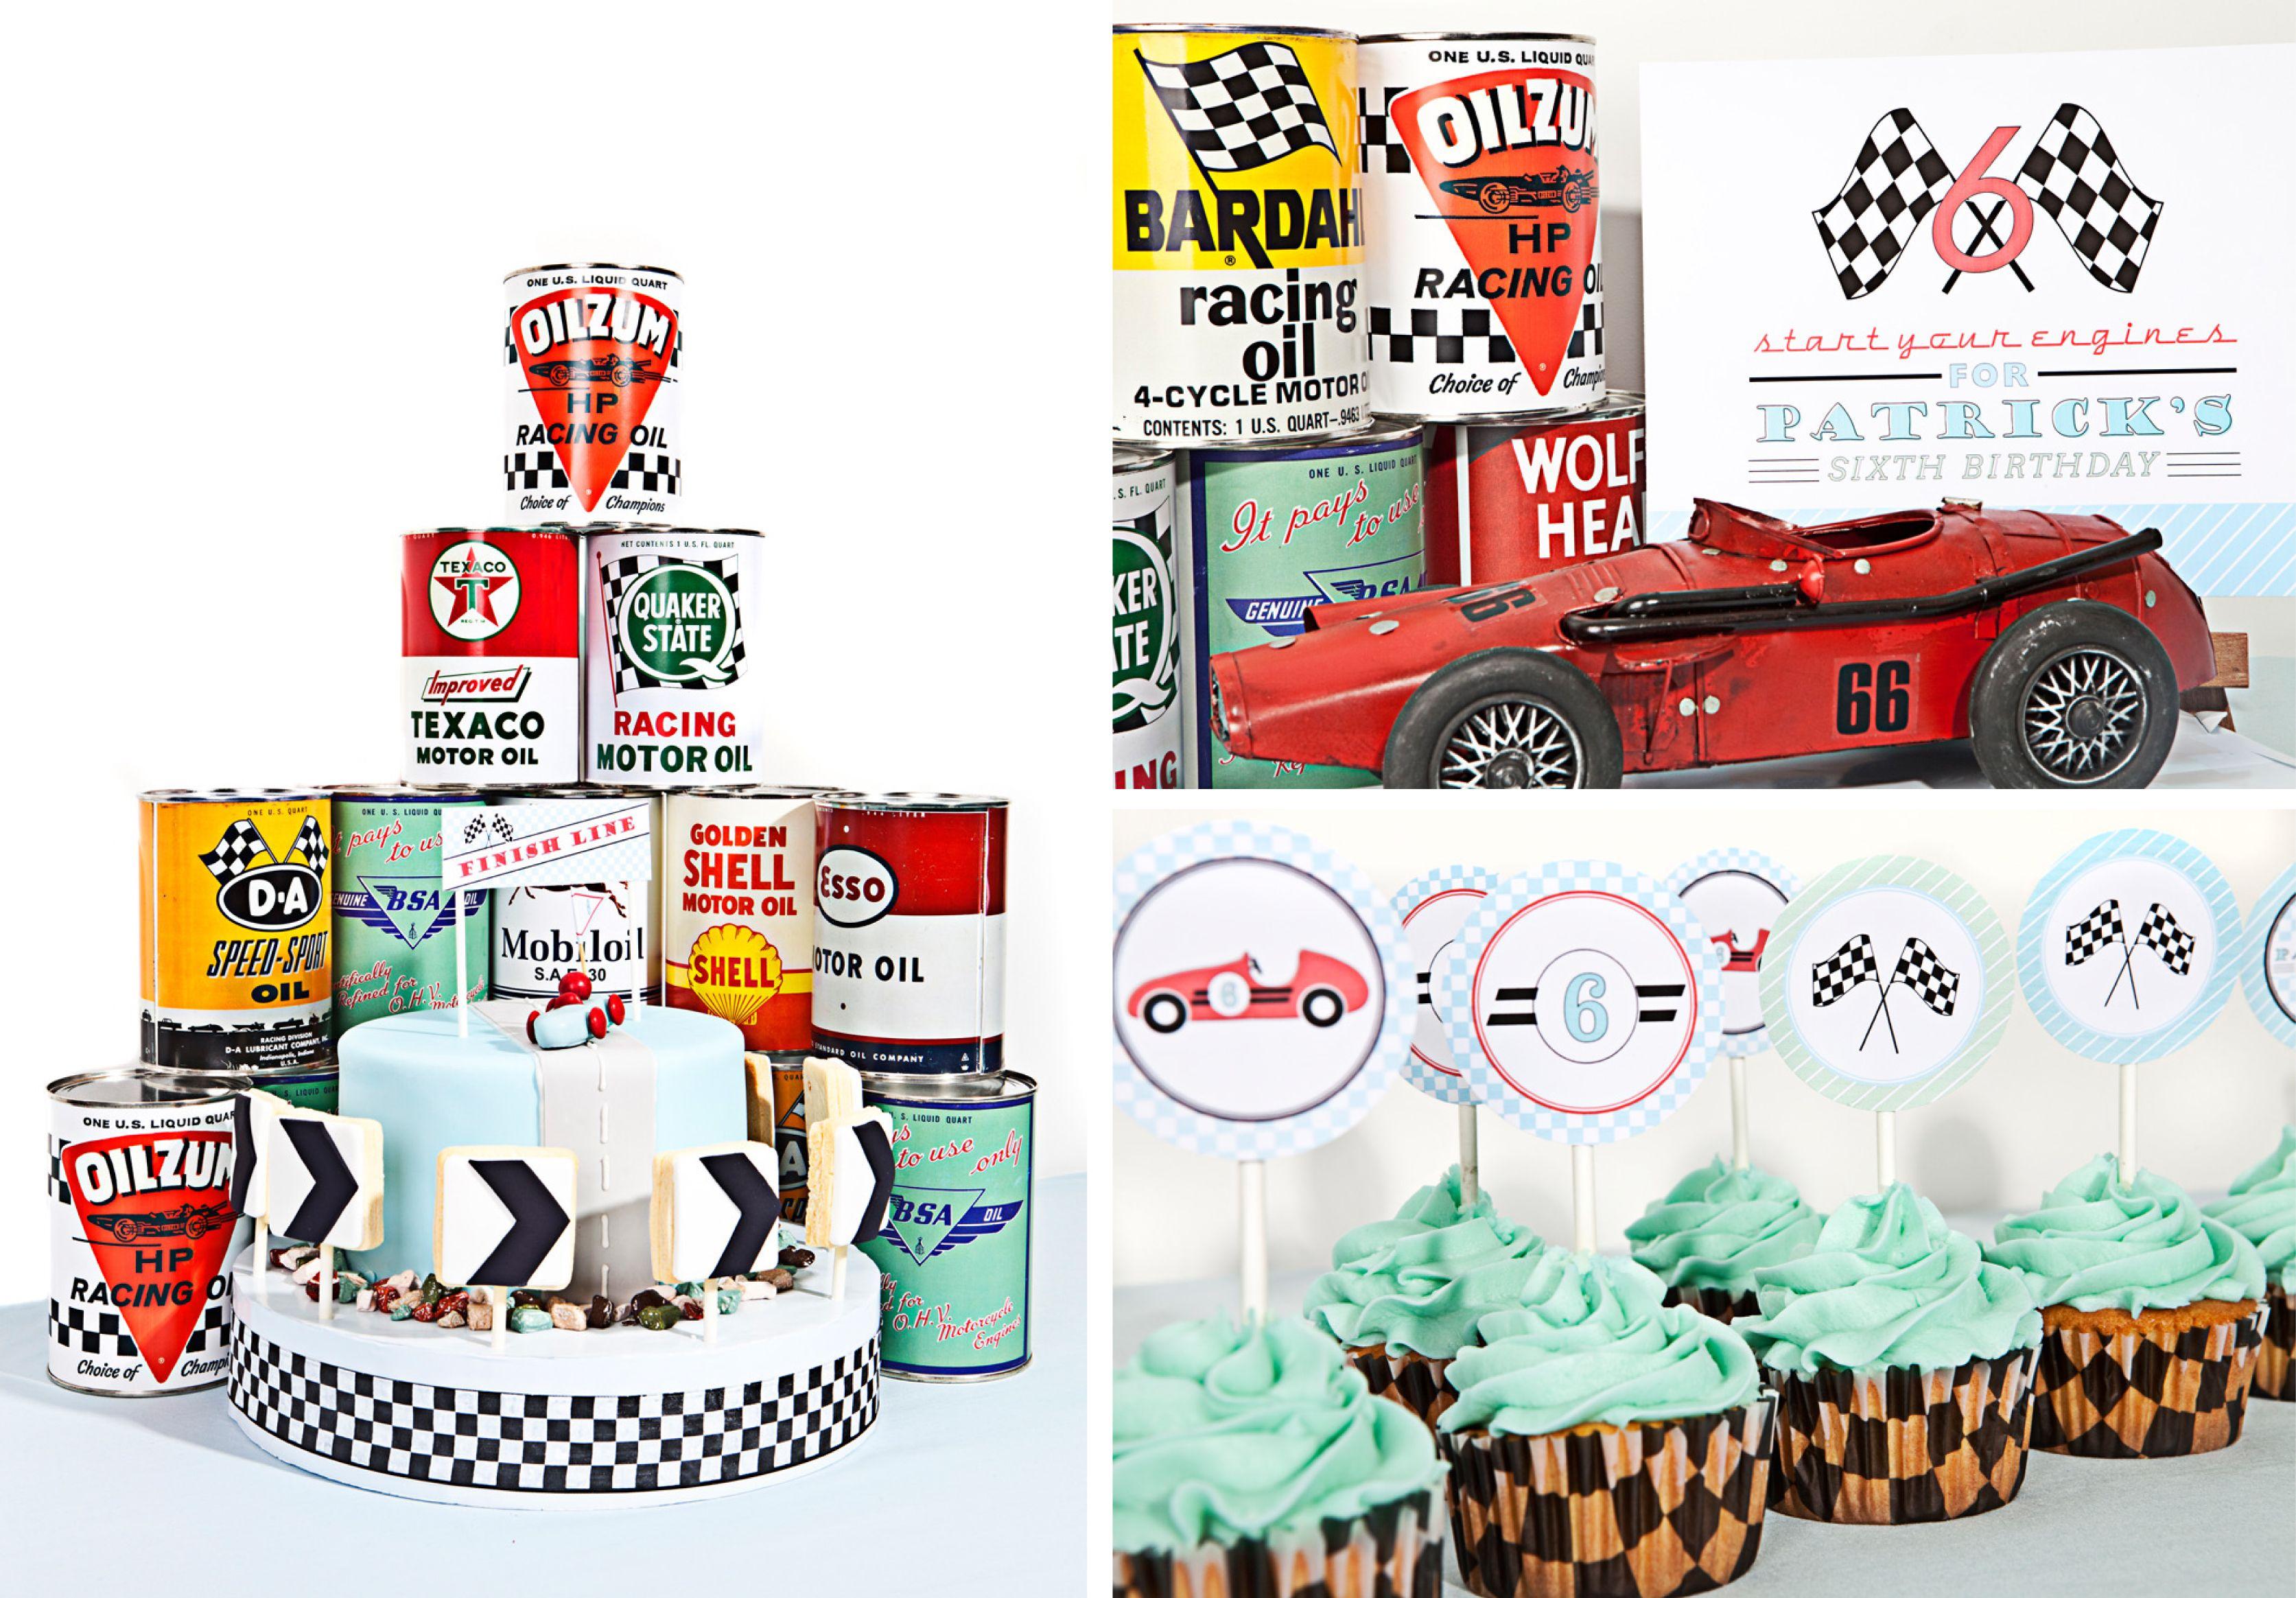 Pin by Jane Garrison on Kelly Shower   Pinterest   Vintage race car ...